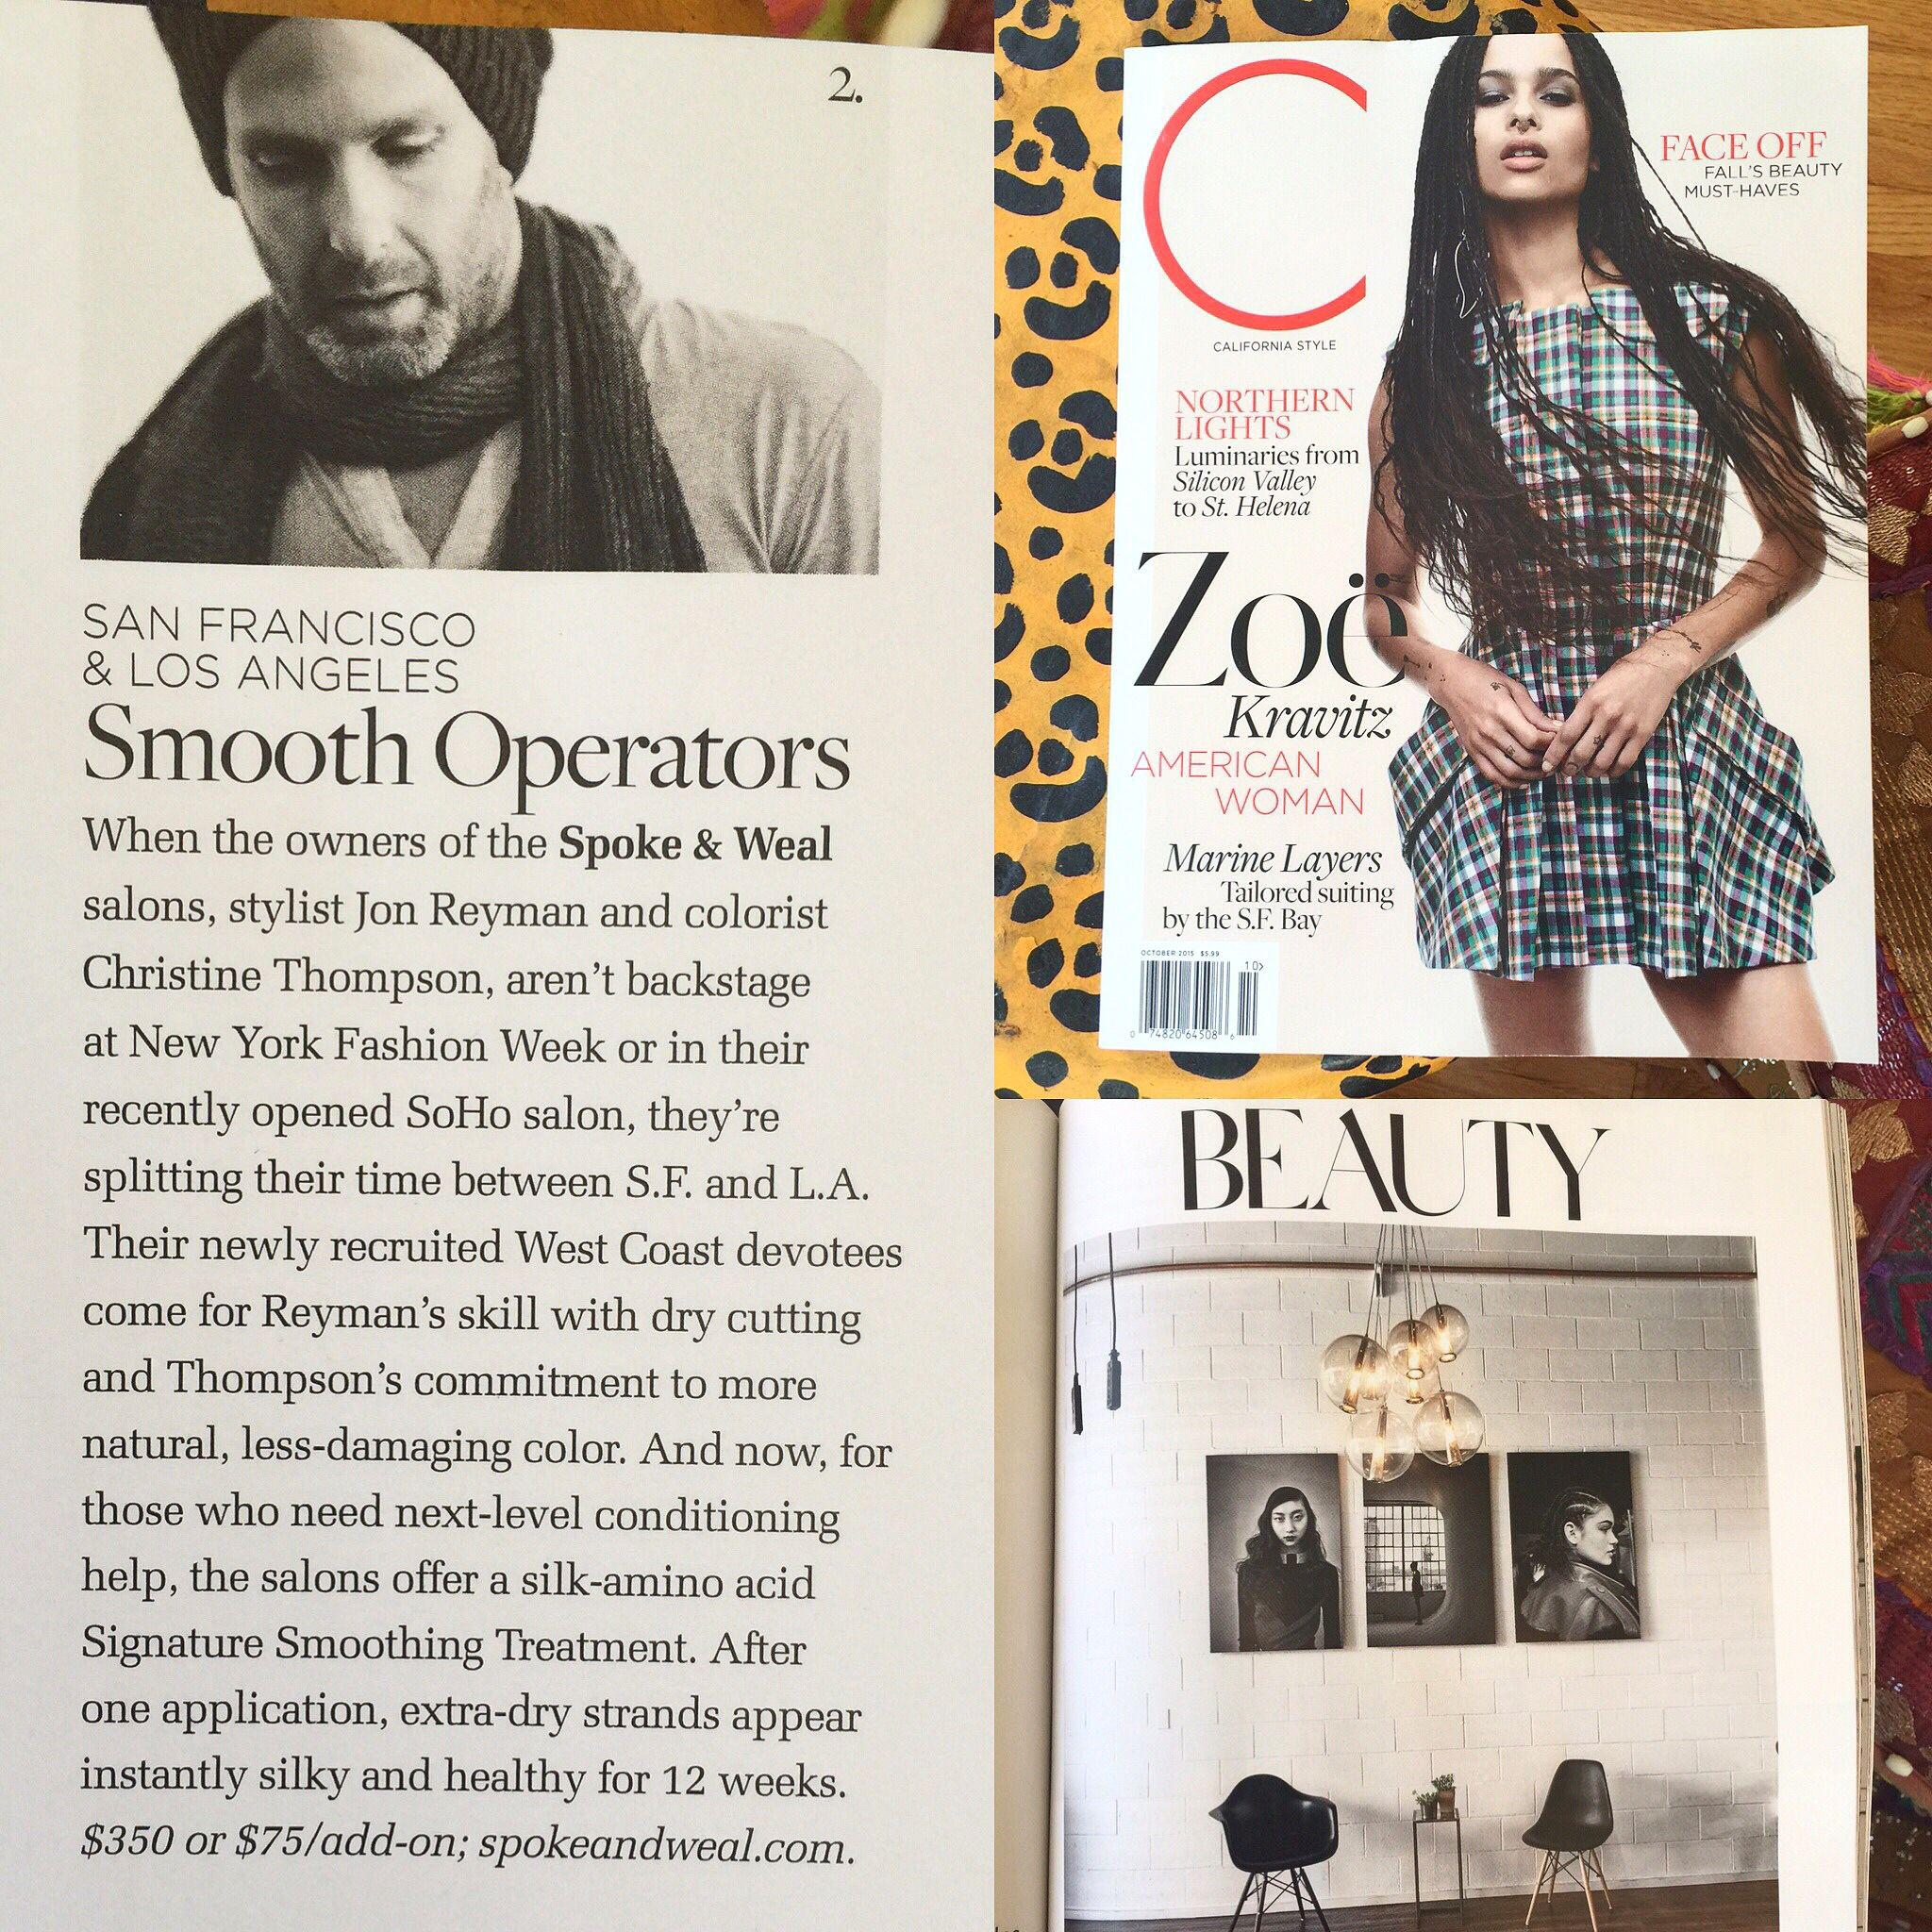 spokeandweal featured in C Magazine's October Issue